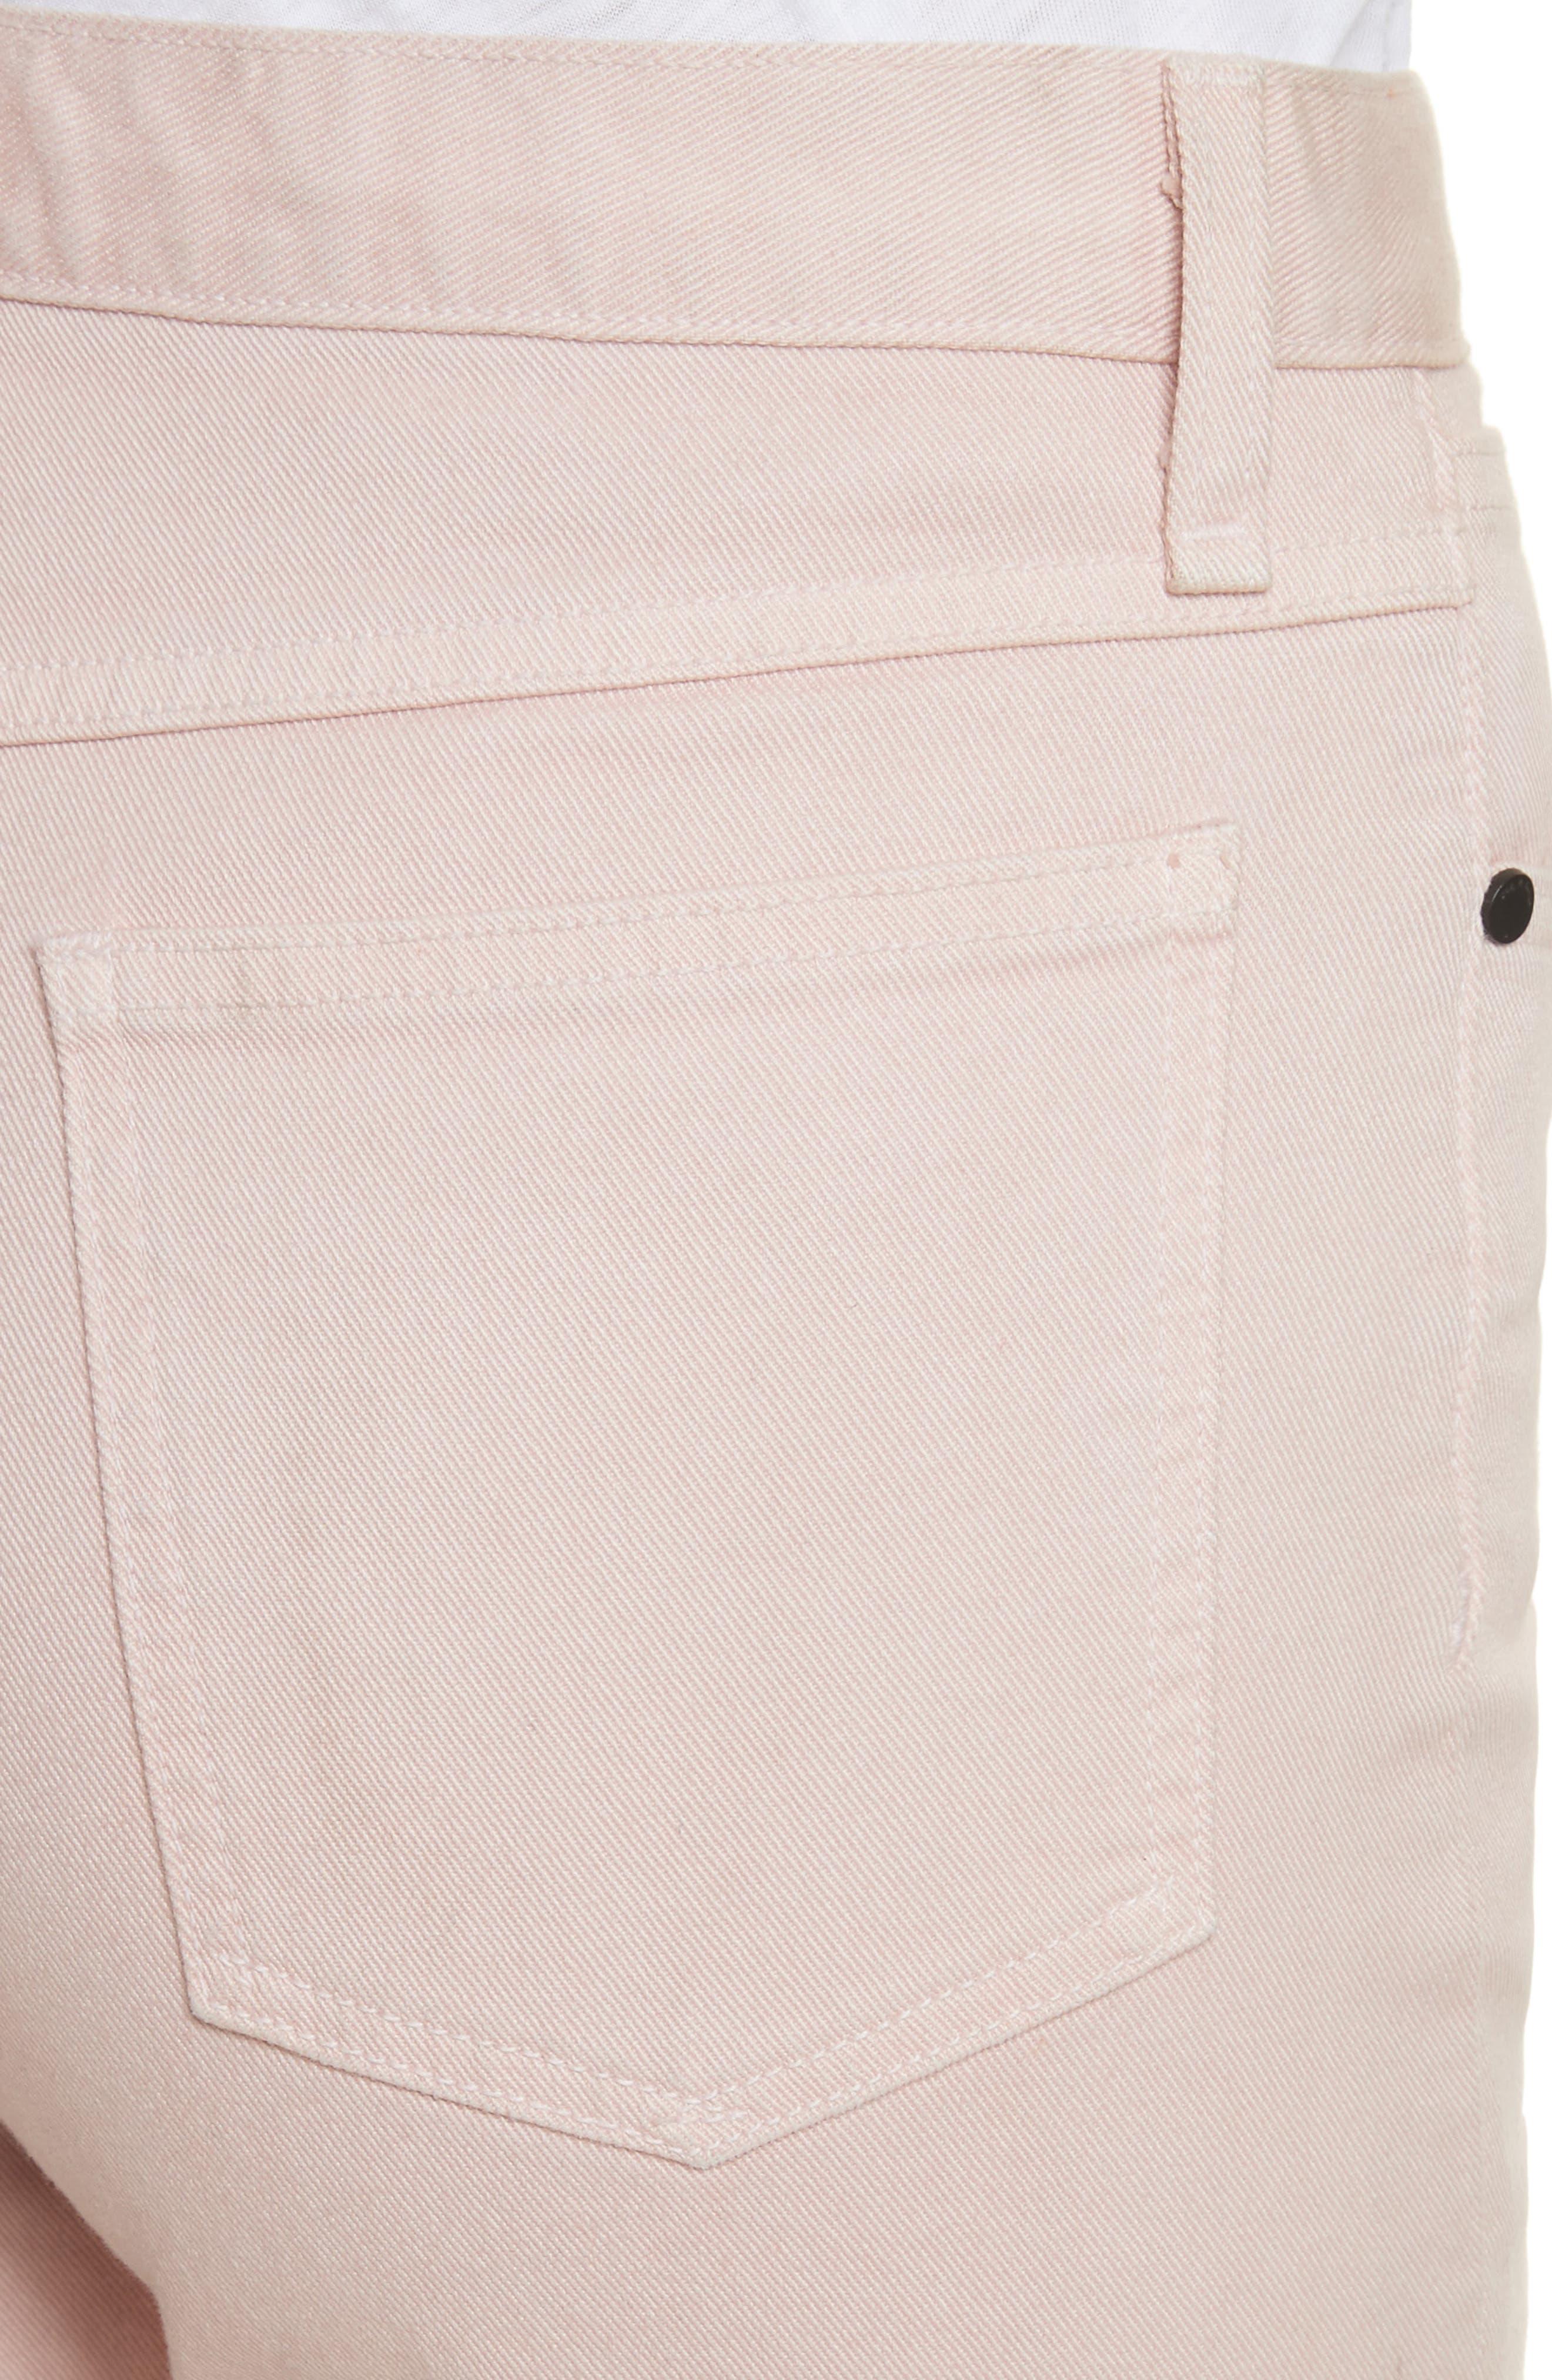 Justine High Waist Trouser Jeans,                             Alternate thumbnail 4, color,